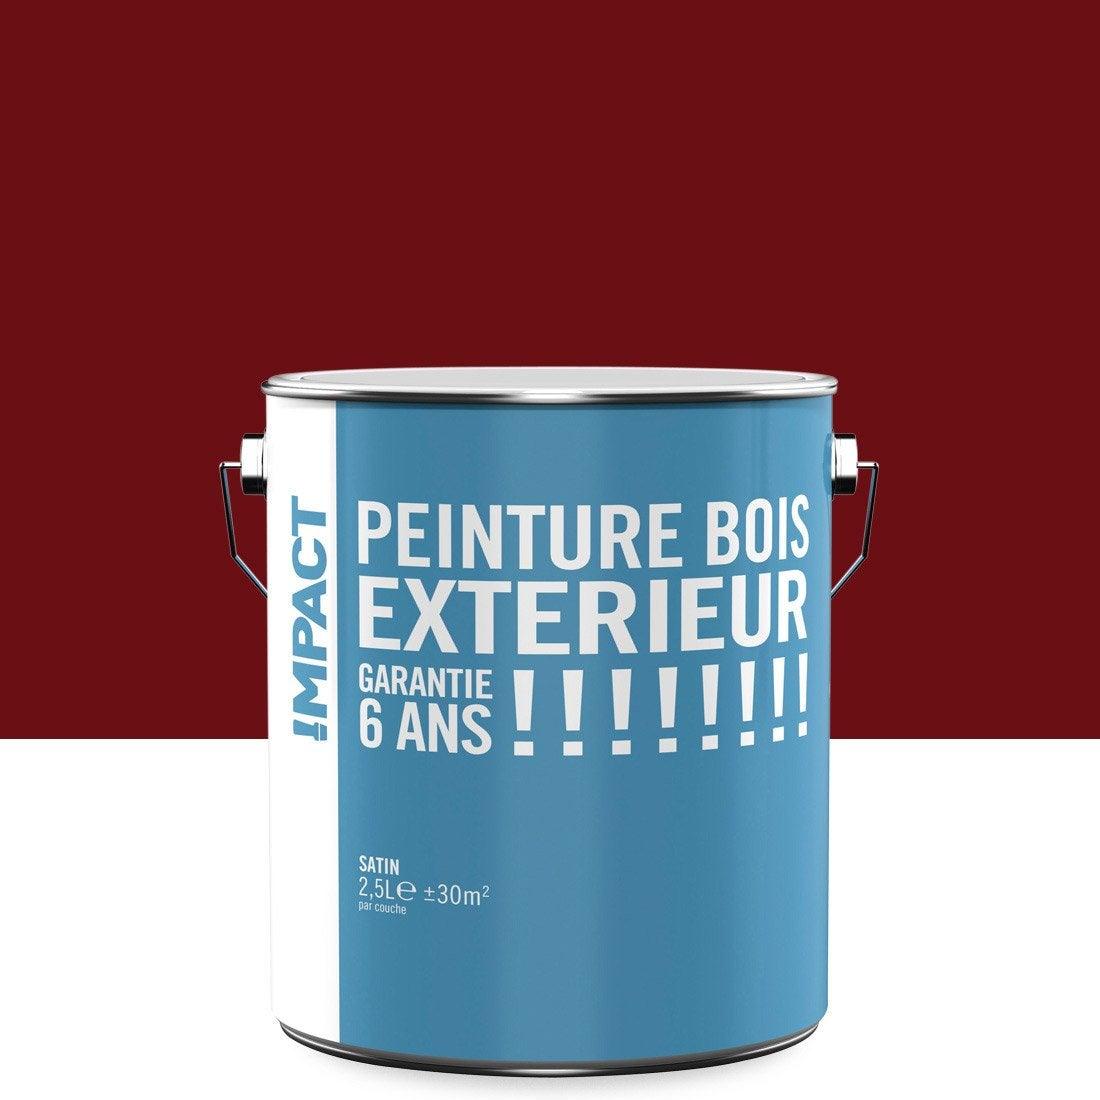 Peinture bois ext rieur impact rouge 2 5 l leroy merlin for Peinture piscine leroy merlin